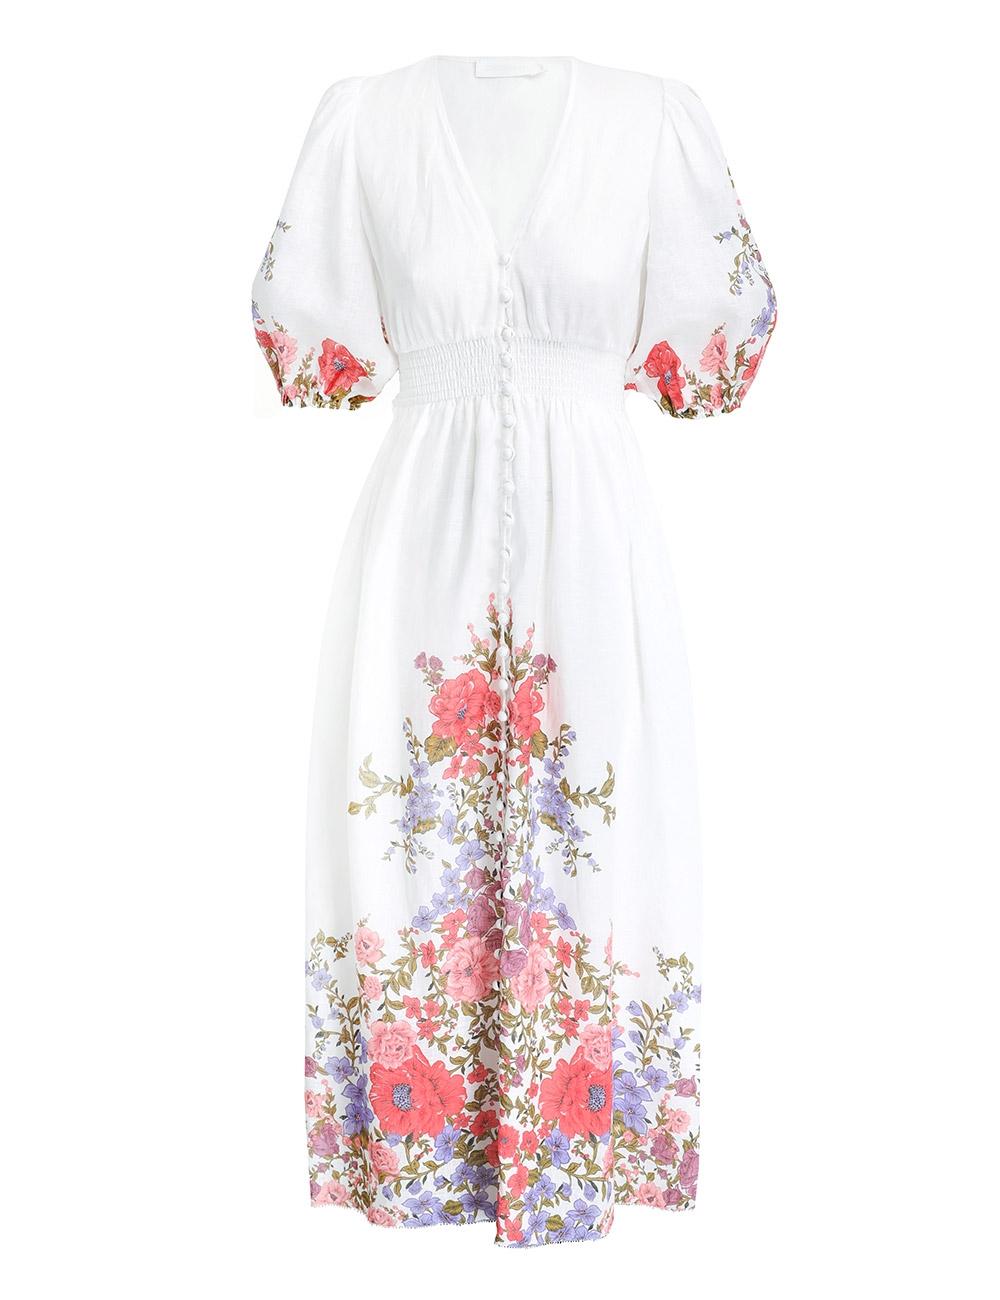 Poppy Shirred Waist Dress